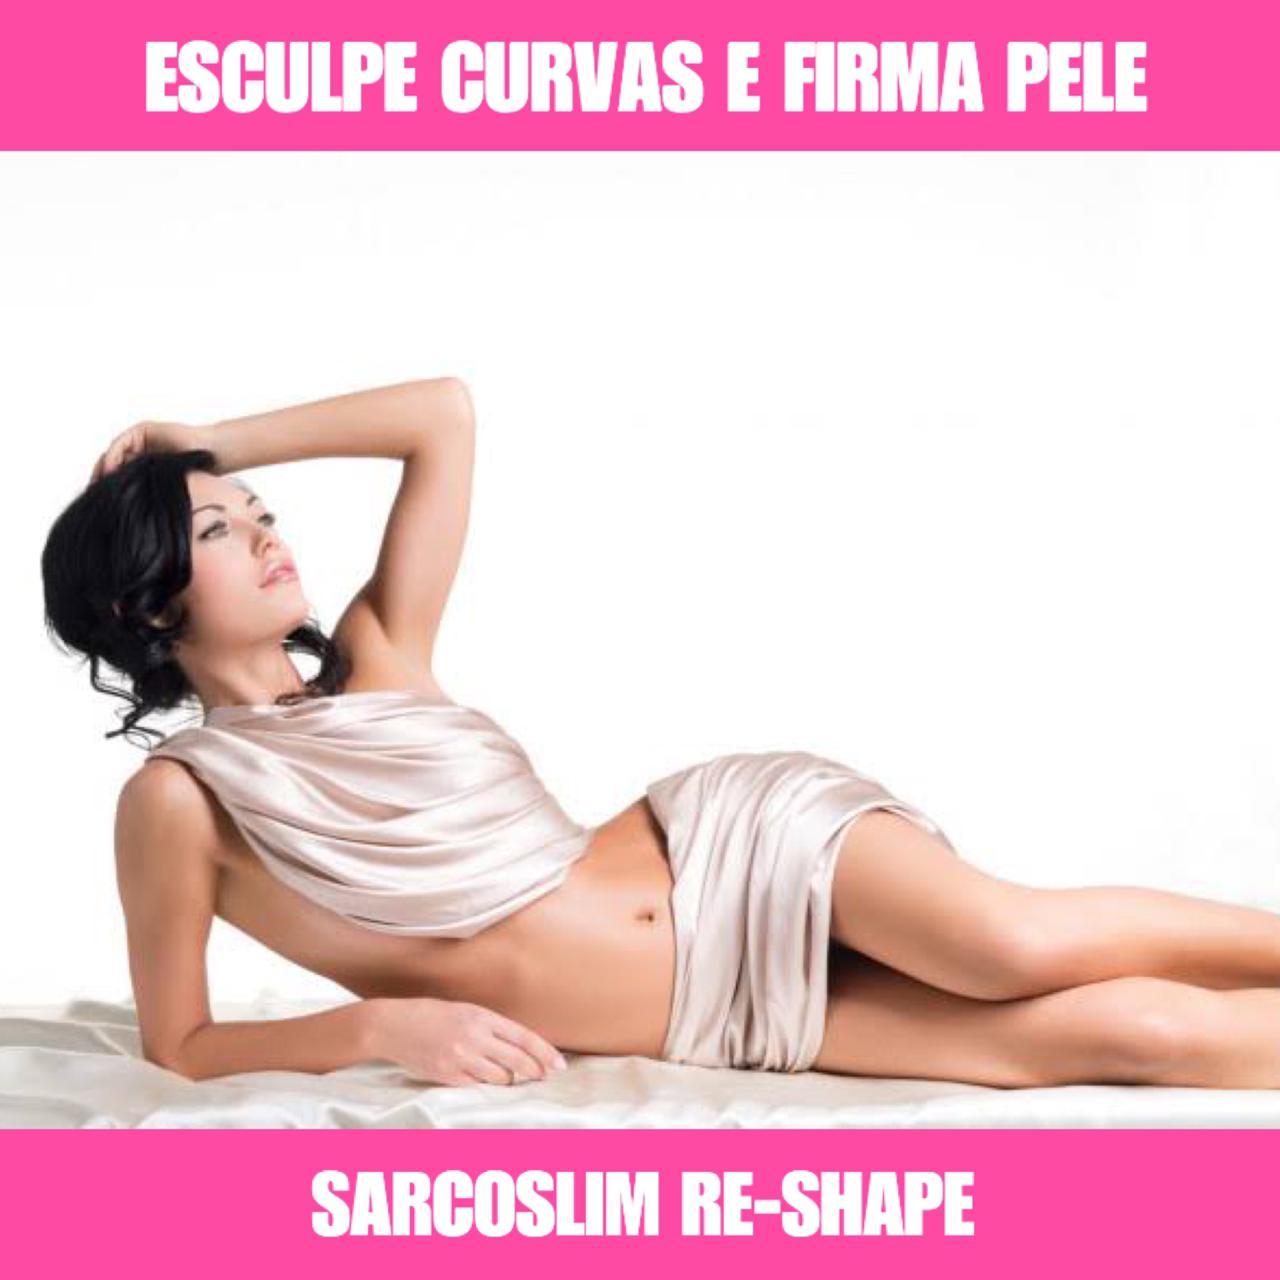 SARCOSLIM RE-SHAPE - 100 G